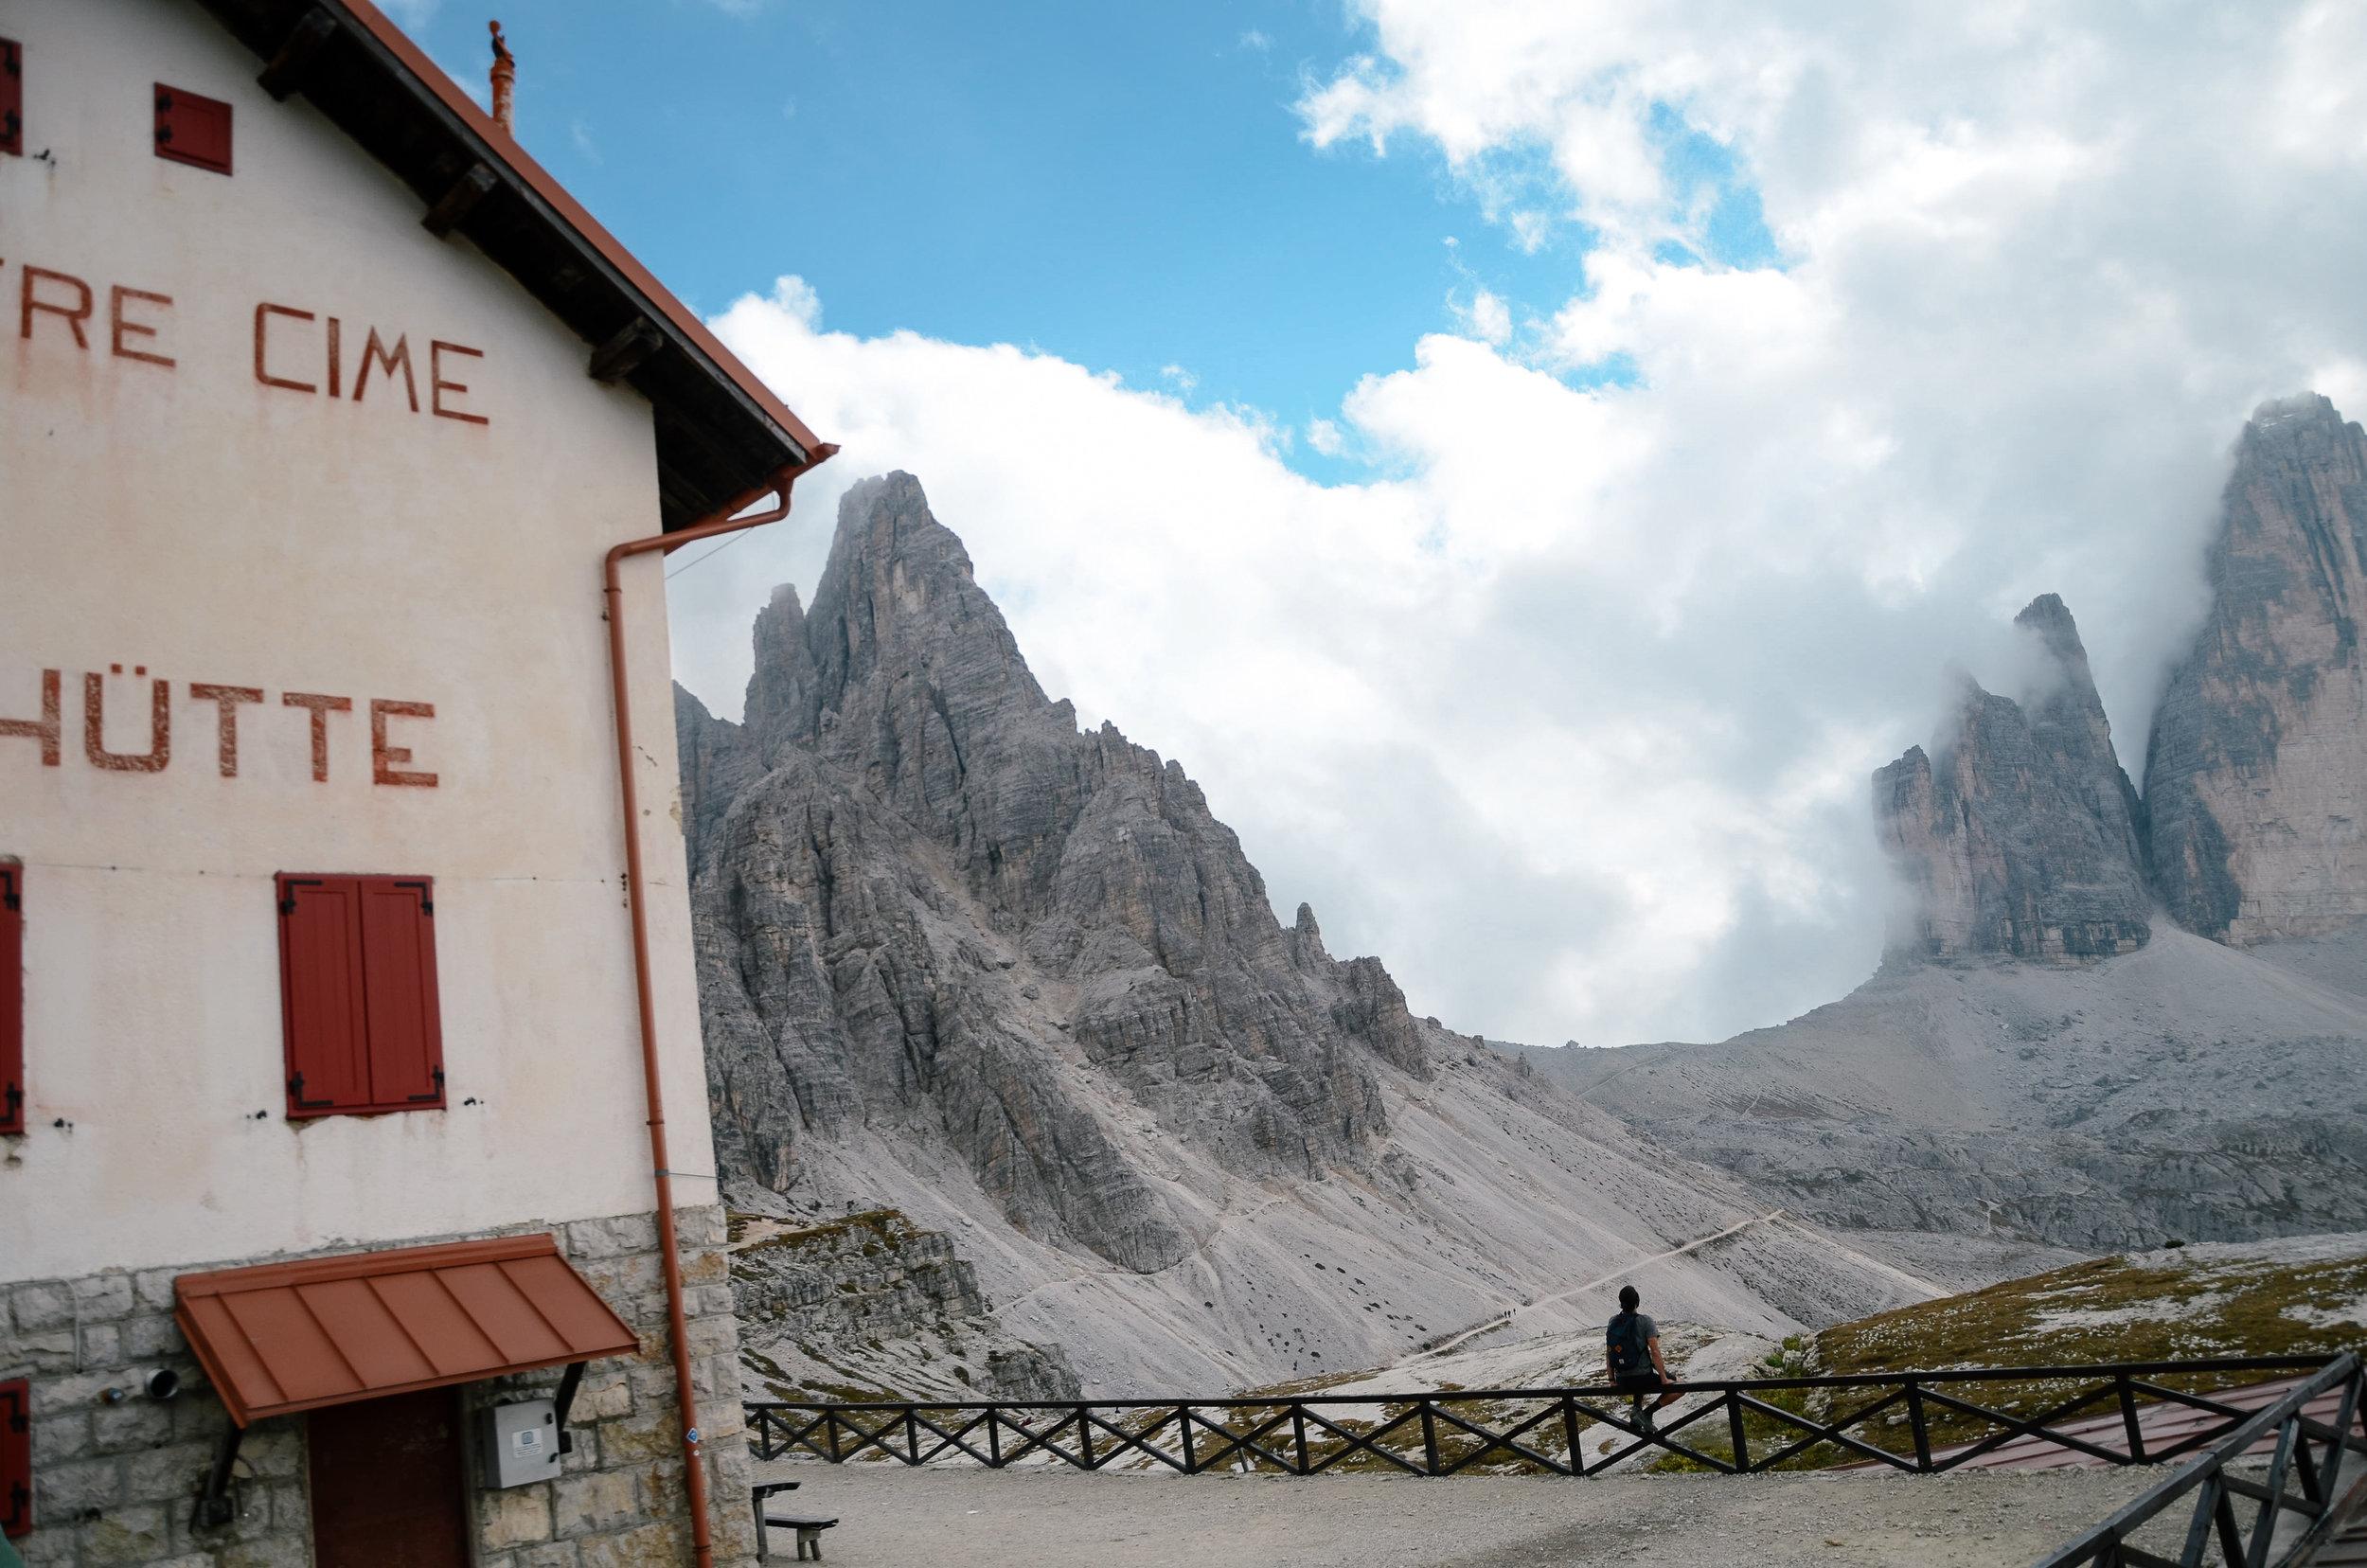 adventure-in-italy-3-hikes-dolomites-hiking-travel-blog-tyrol-12.jpg